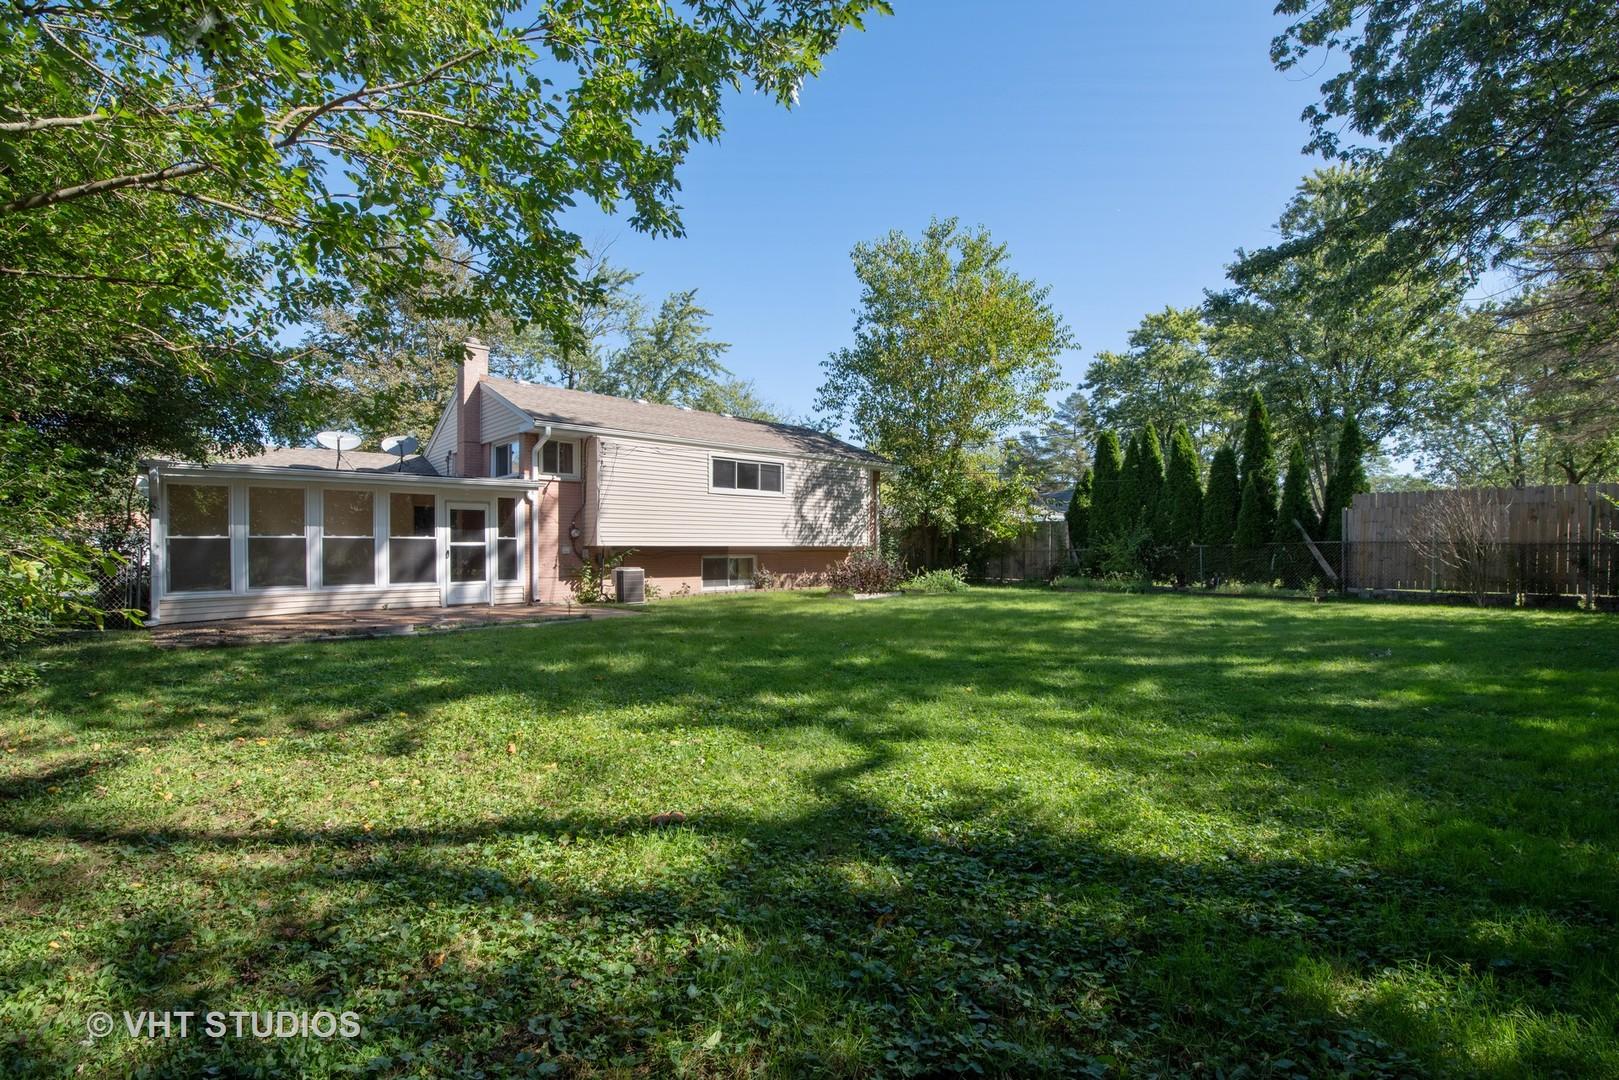 3005 Knollwood, Glenview, Illinois, 60025